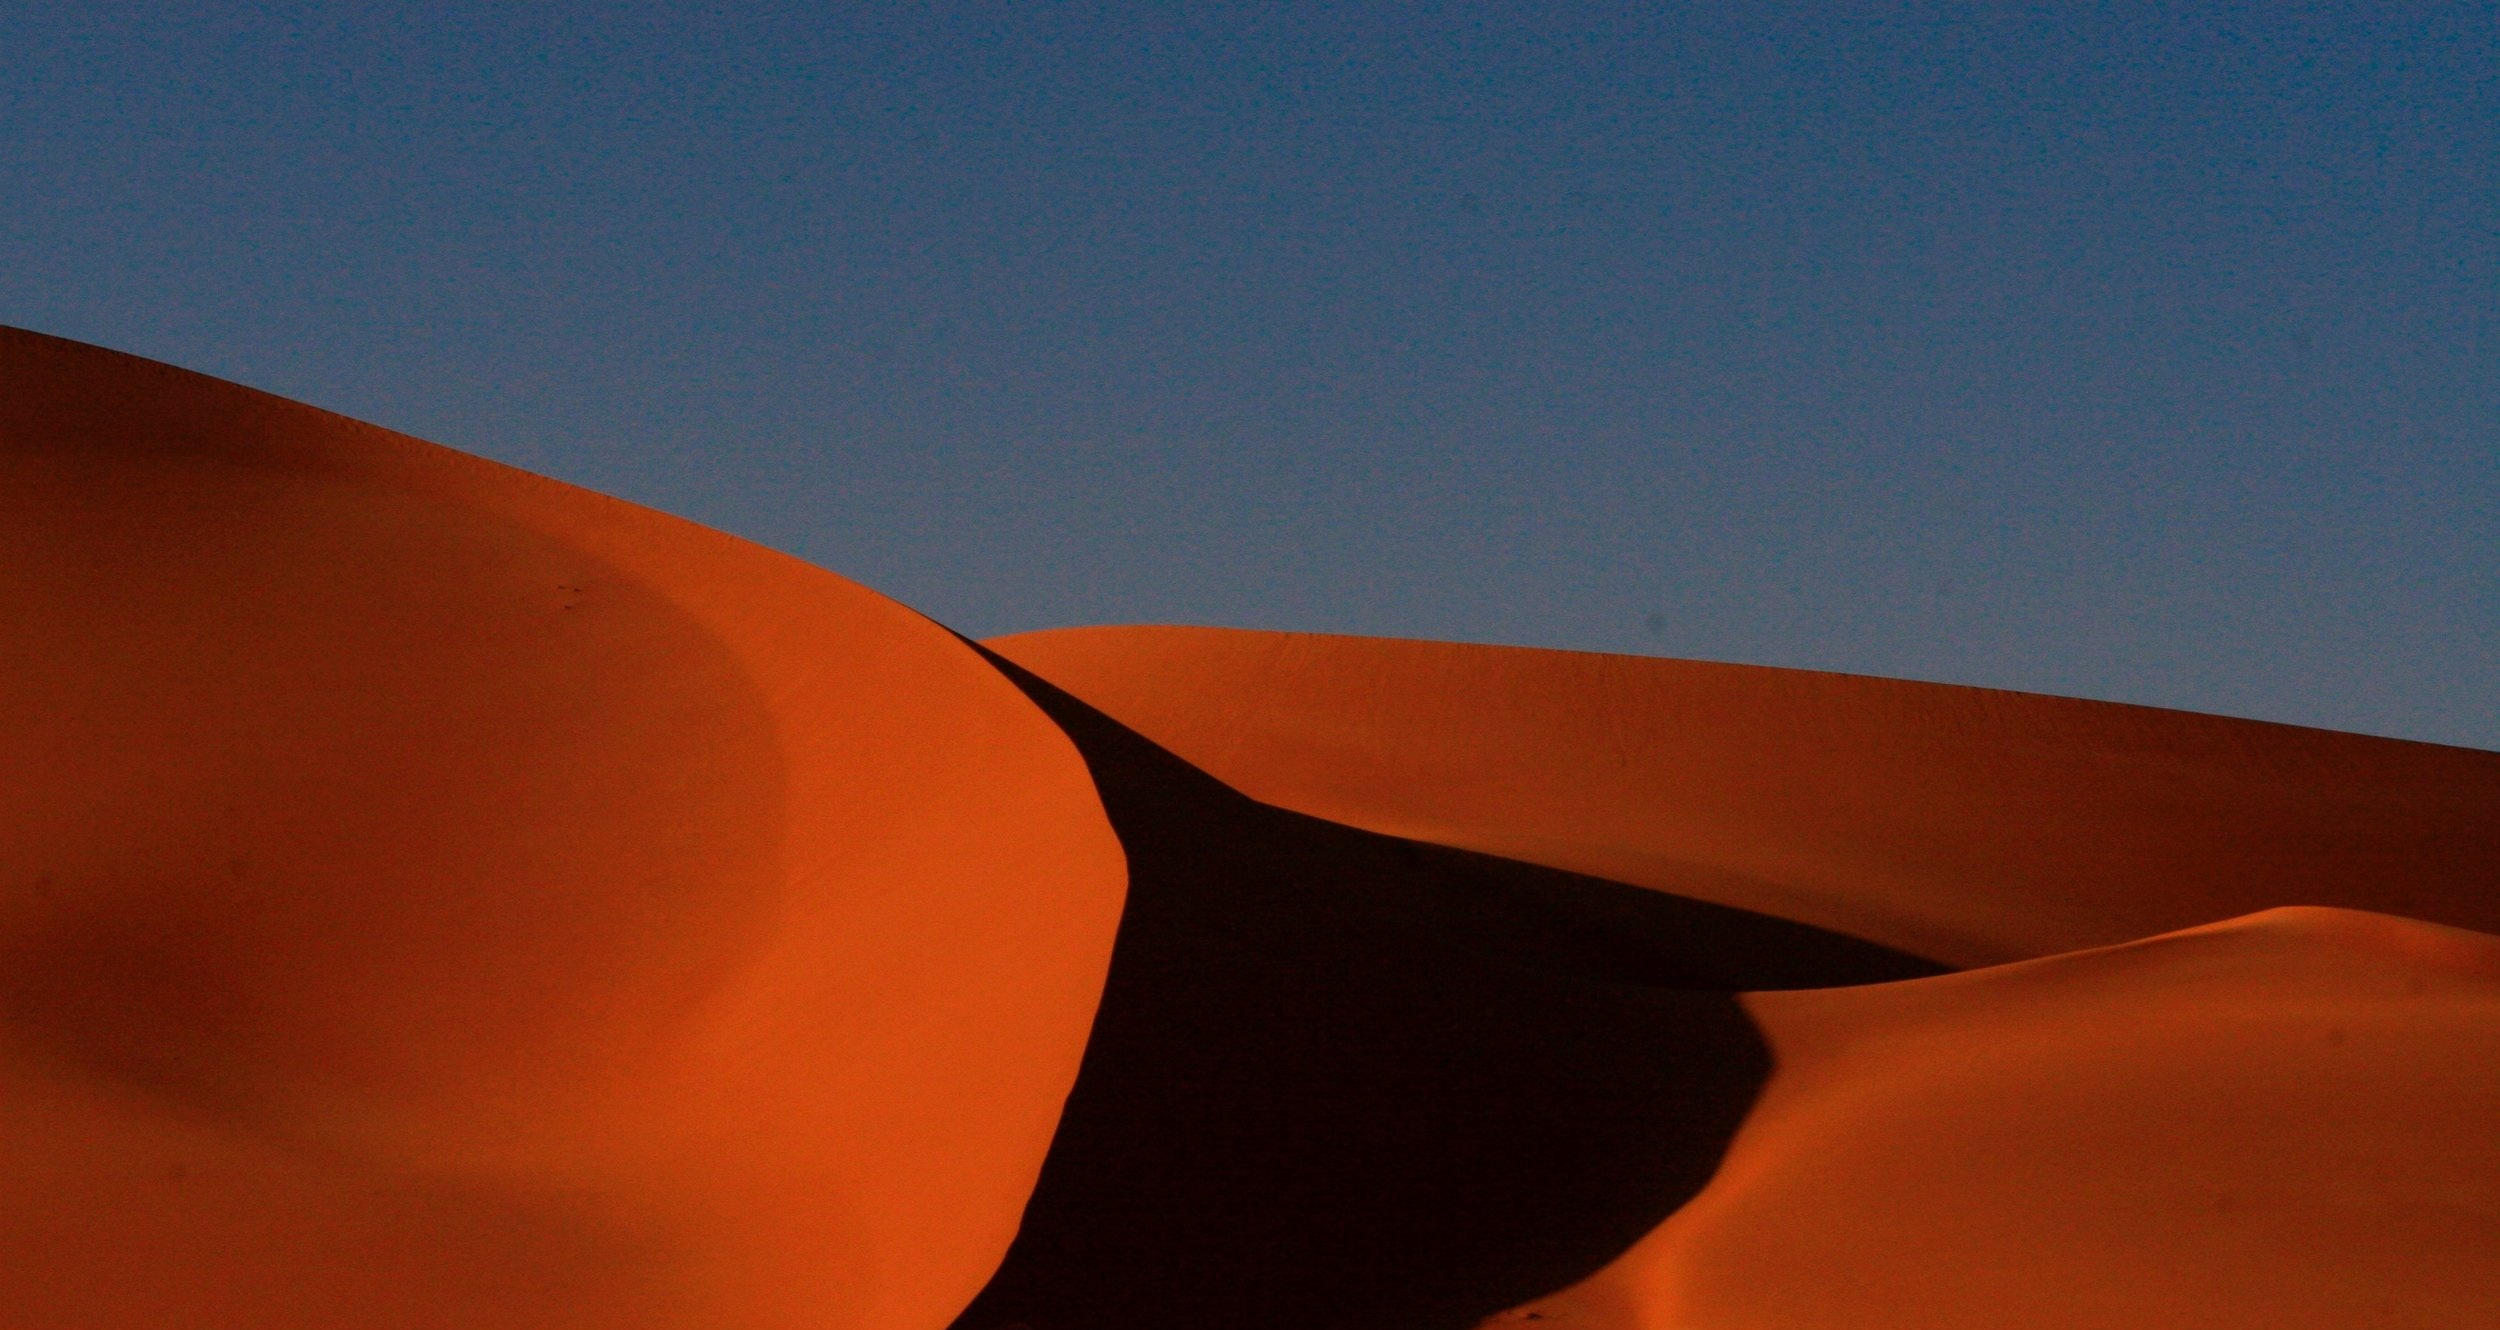 Dunes in Murzuq, Libya, Photo by    Audrius Sutkus    on    Unsplash   .